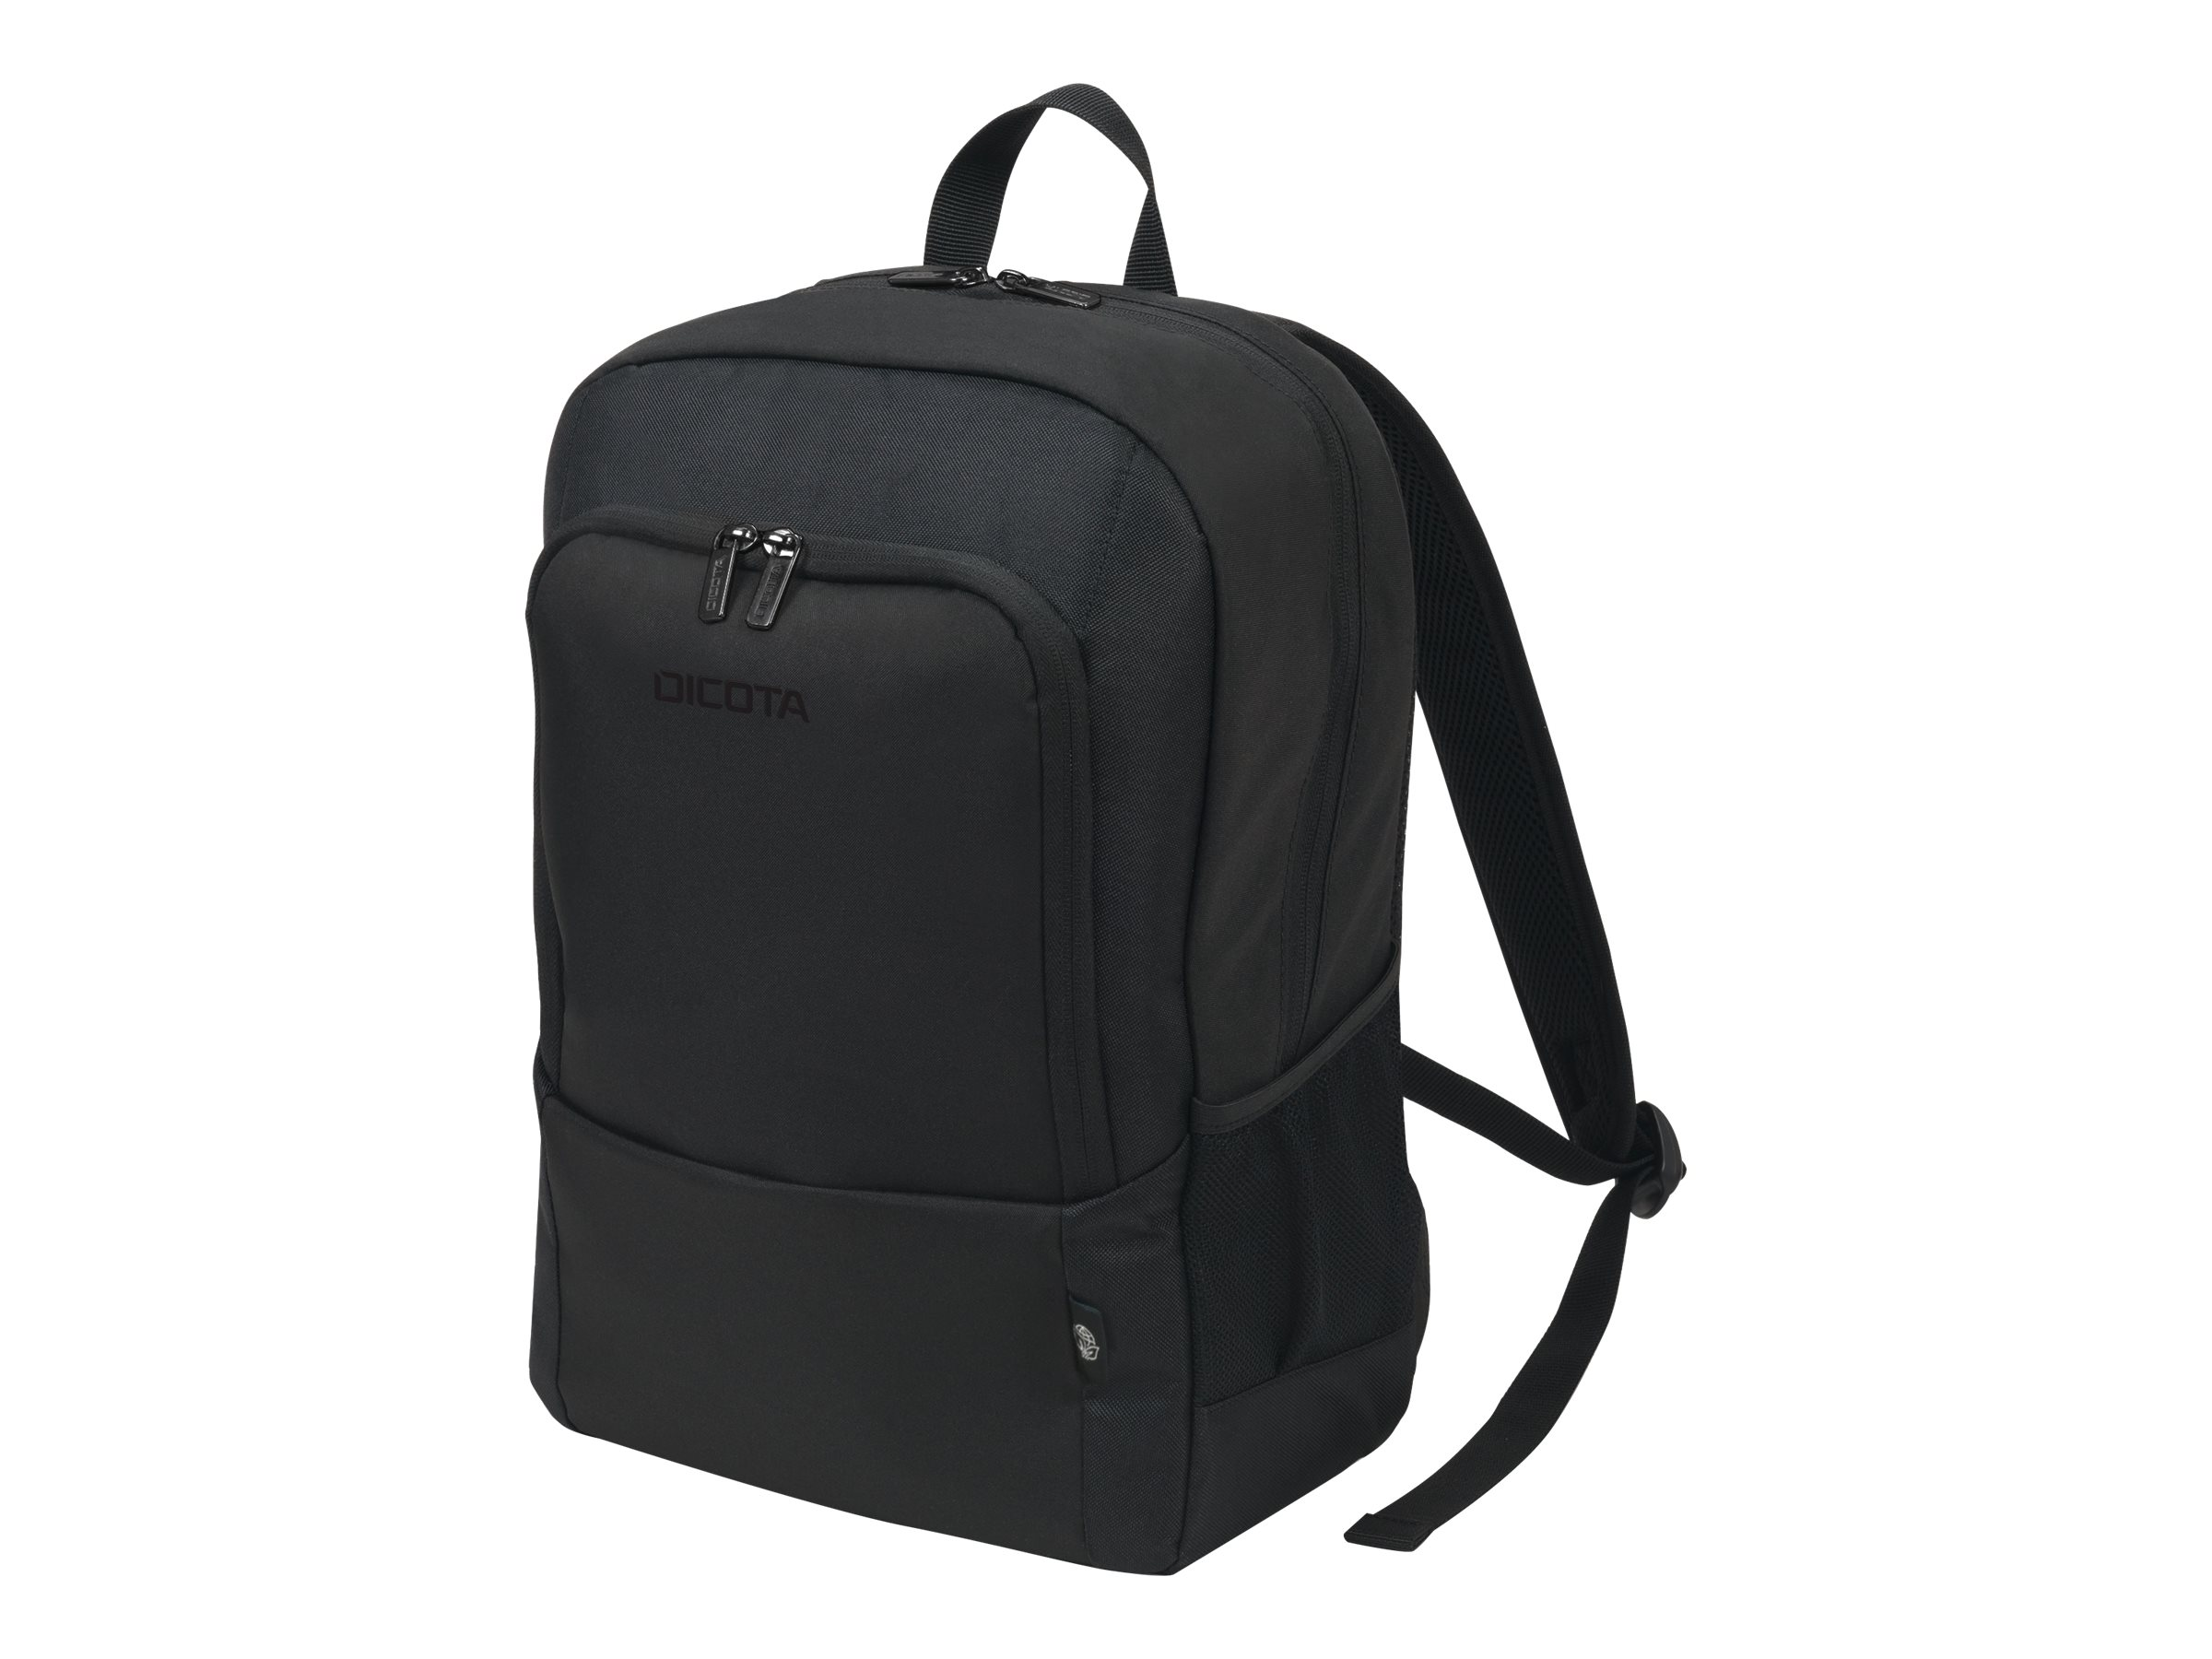 DICOTA Eco BASE - Notebook-Rucksack - 43.9 cm - 15